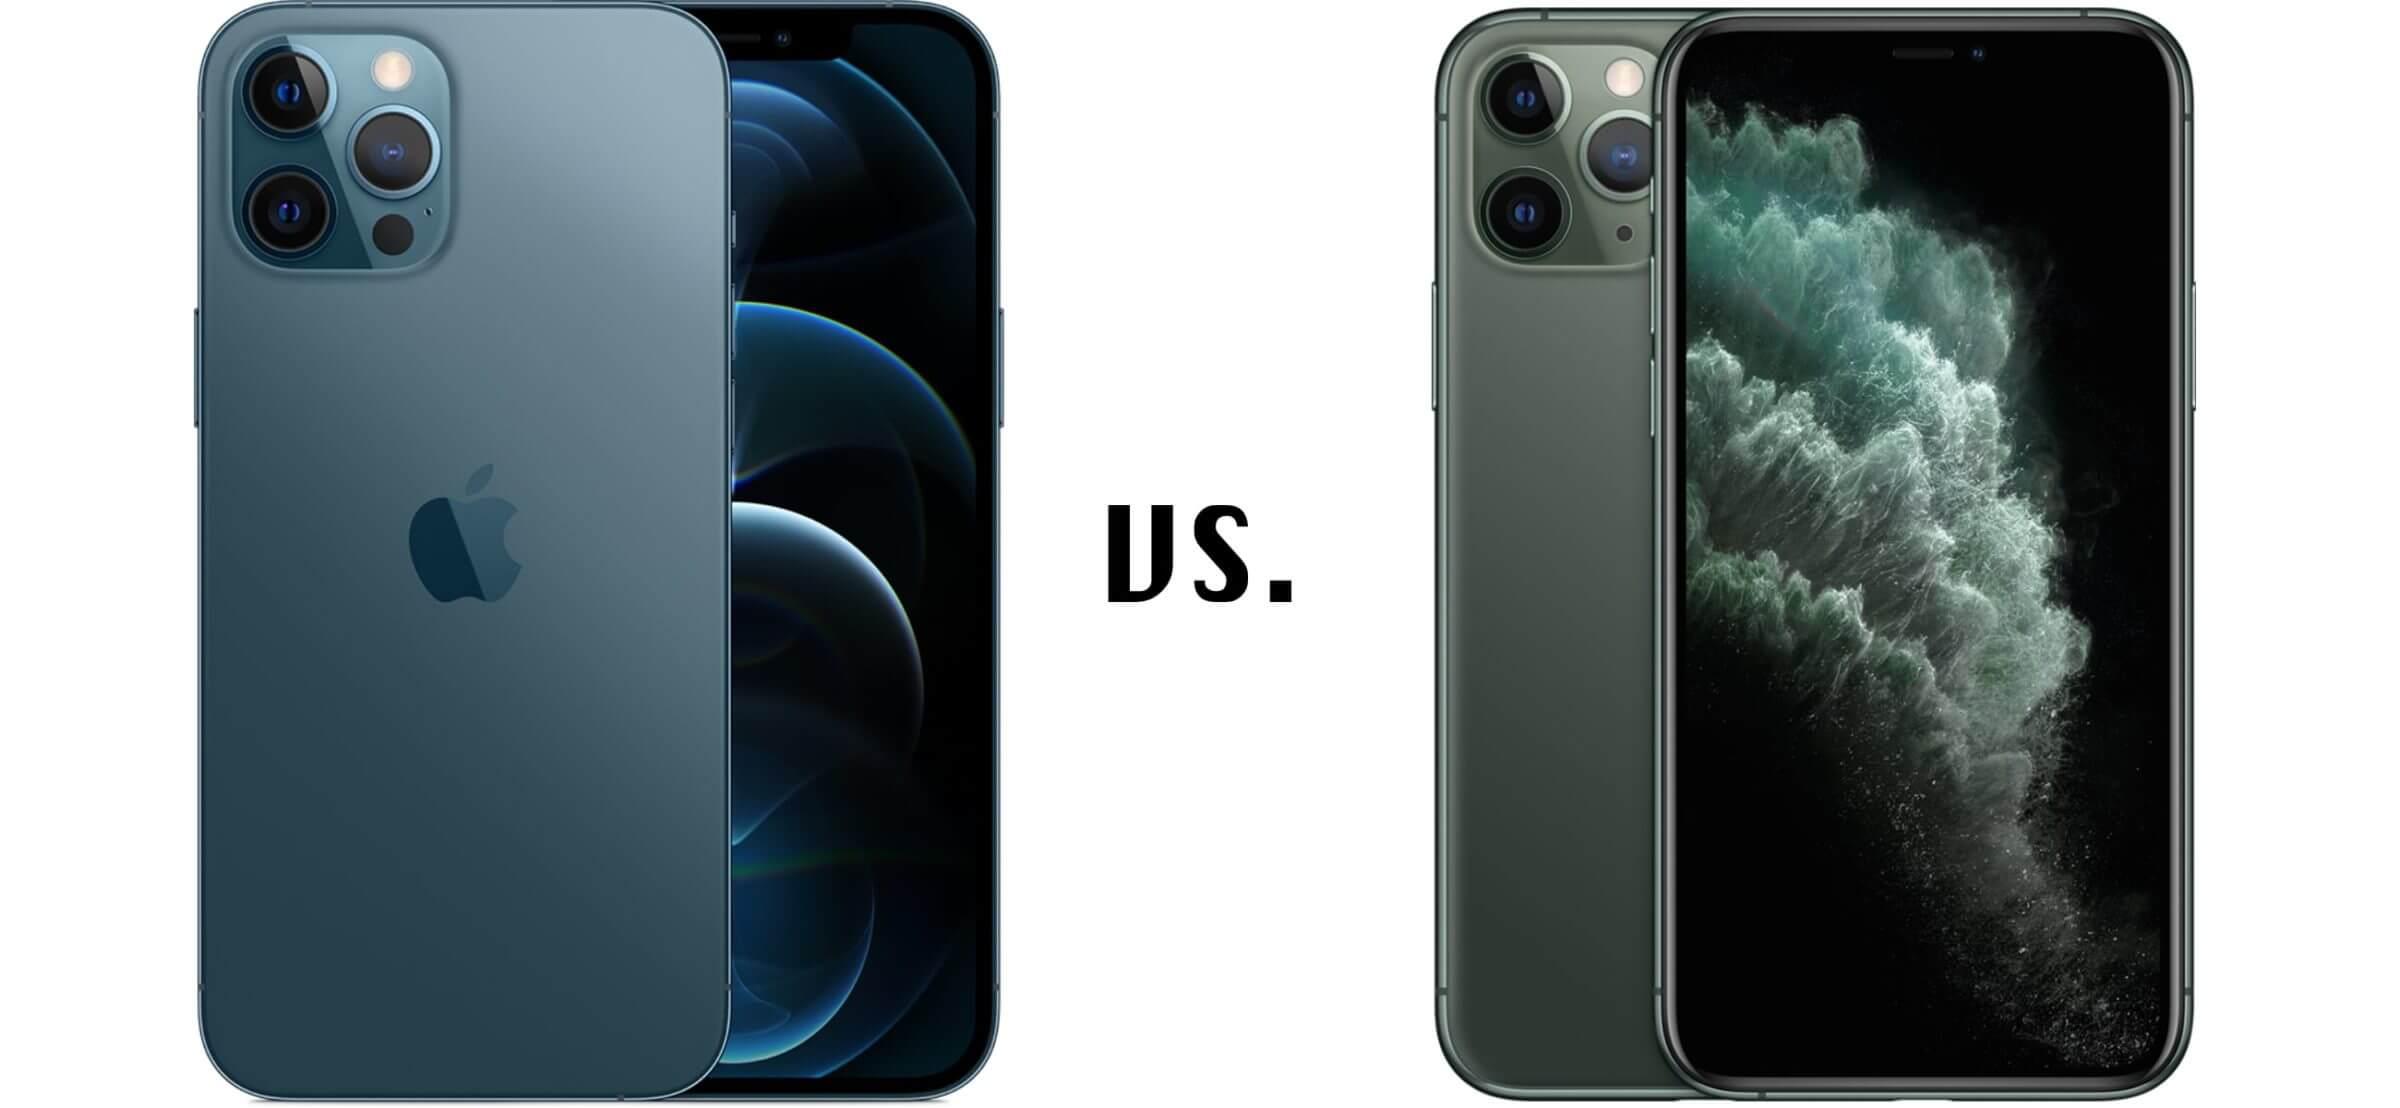 iPhone 12 Pro Max vs. iPhone 11 Pro